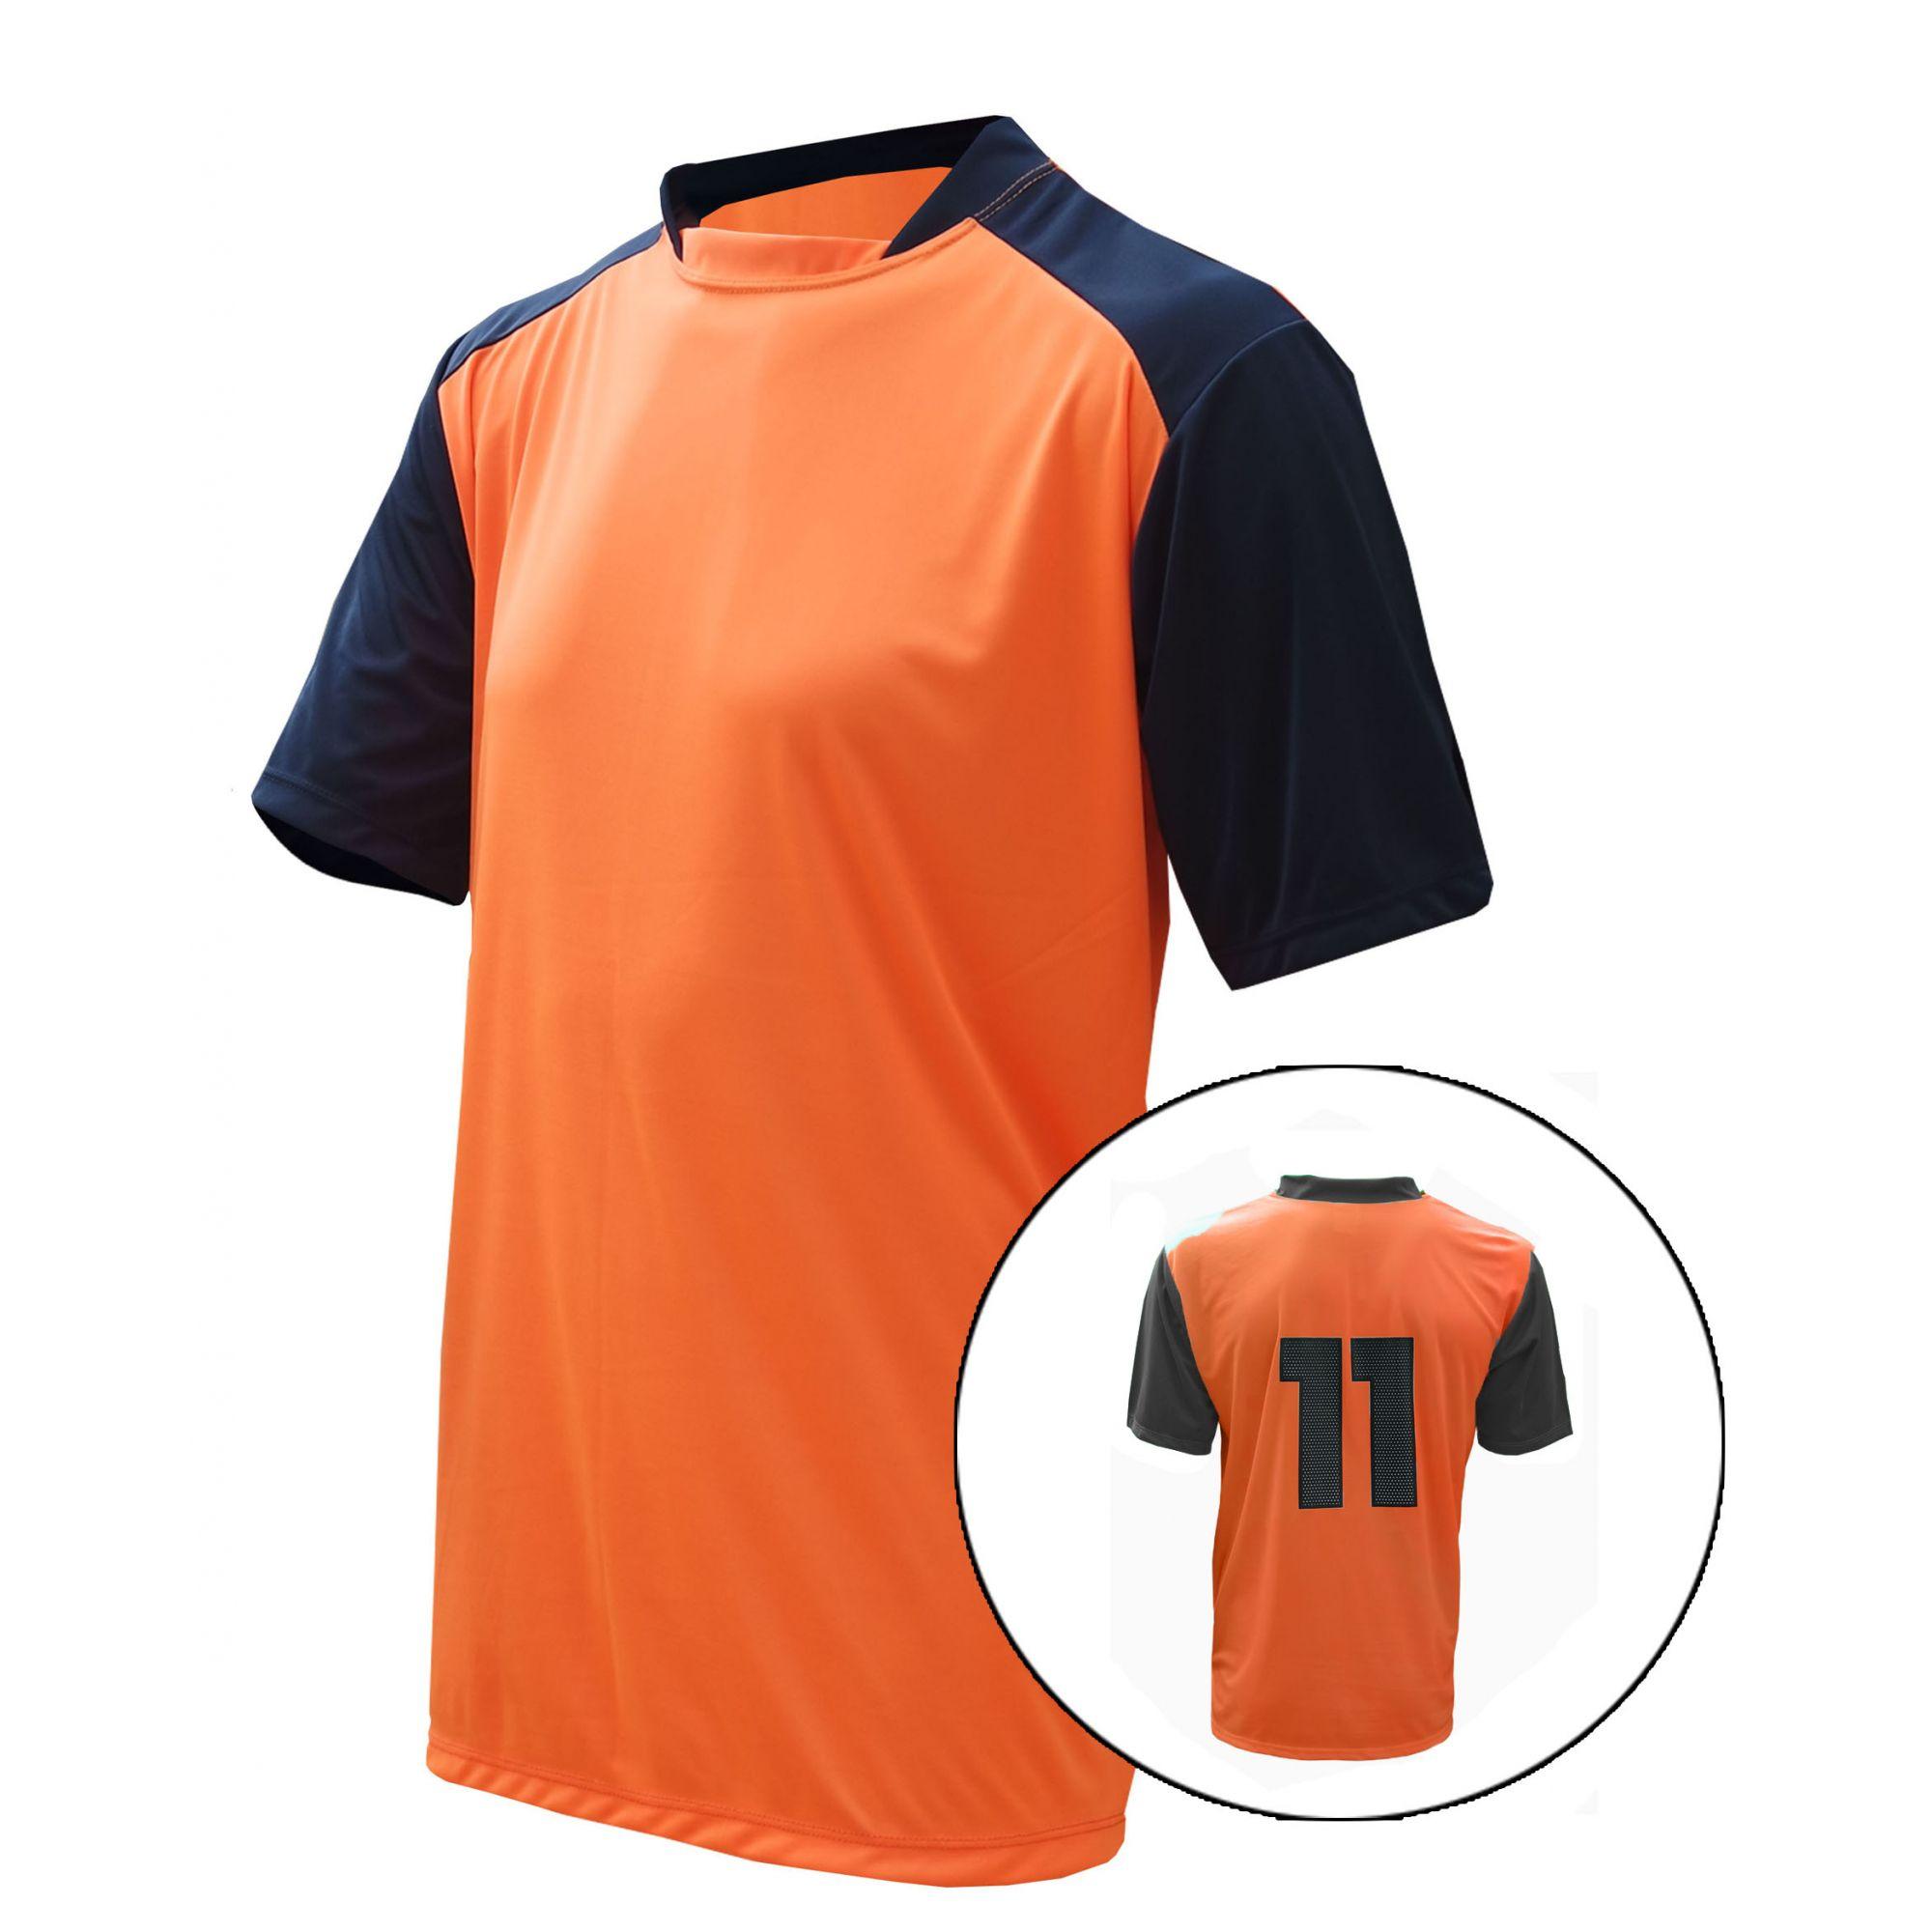 Camisa de Futebol Trivela